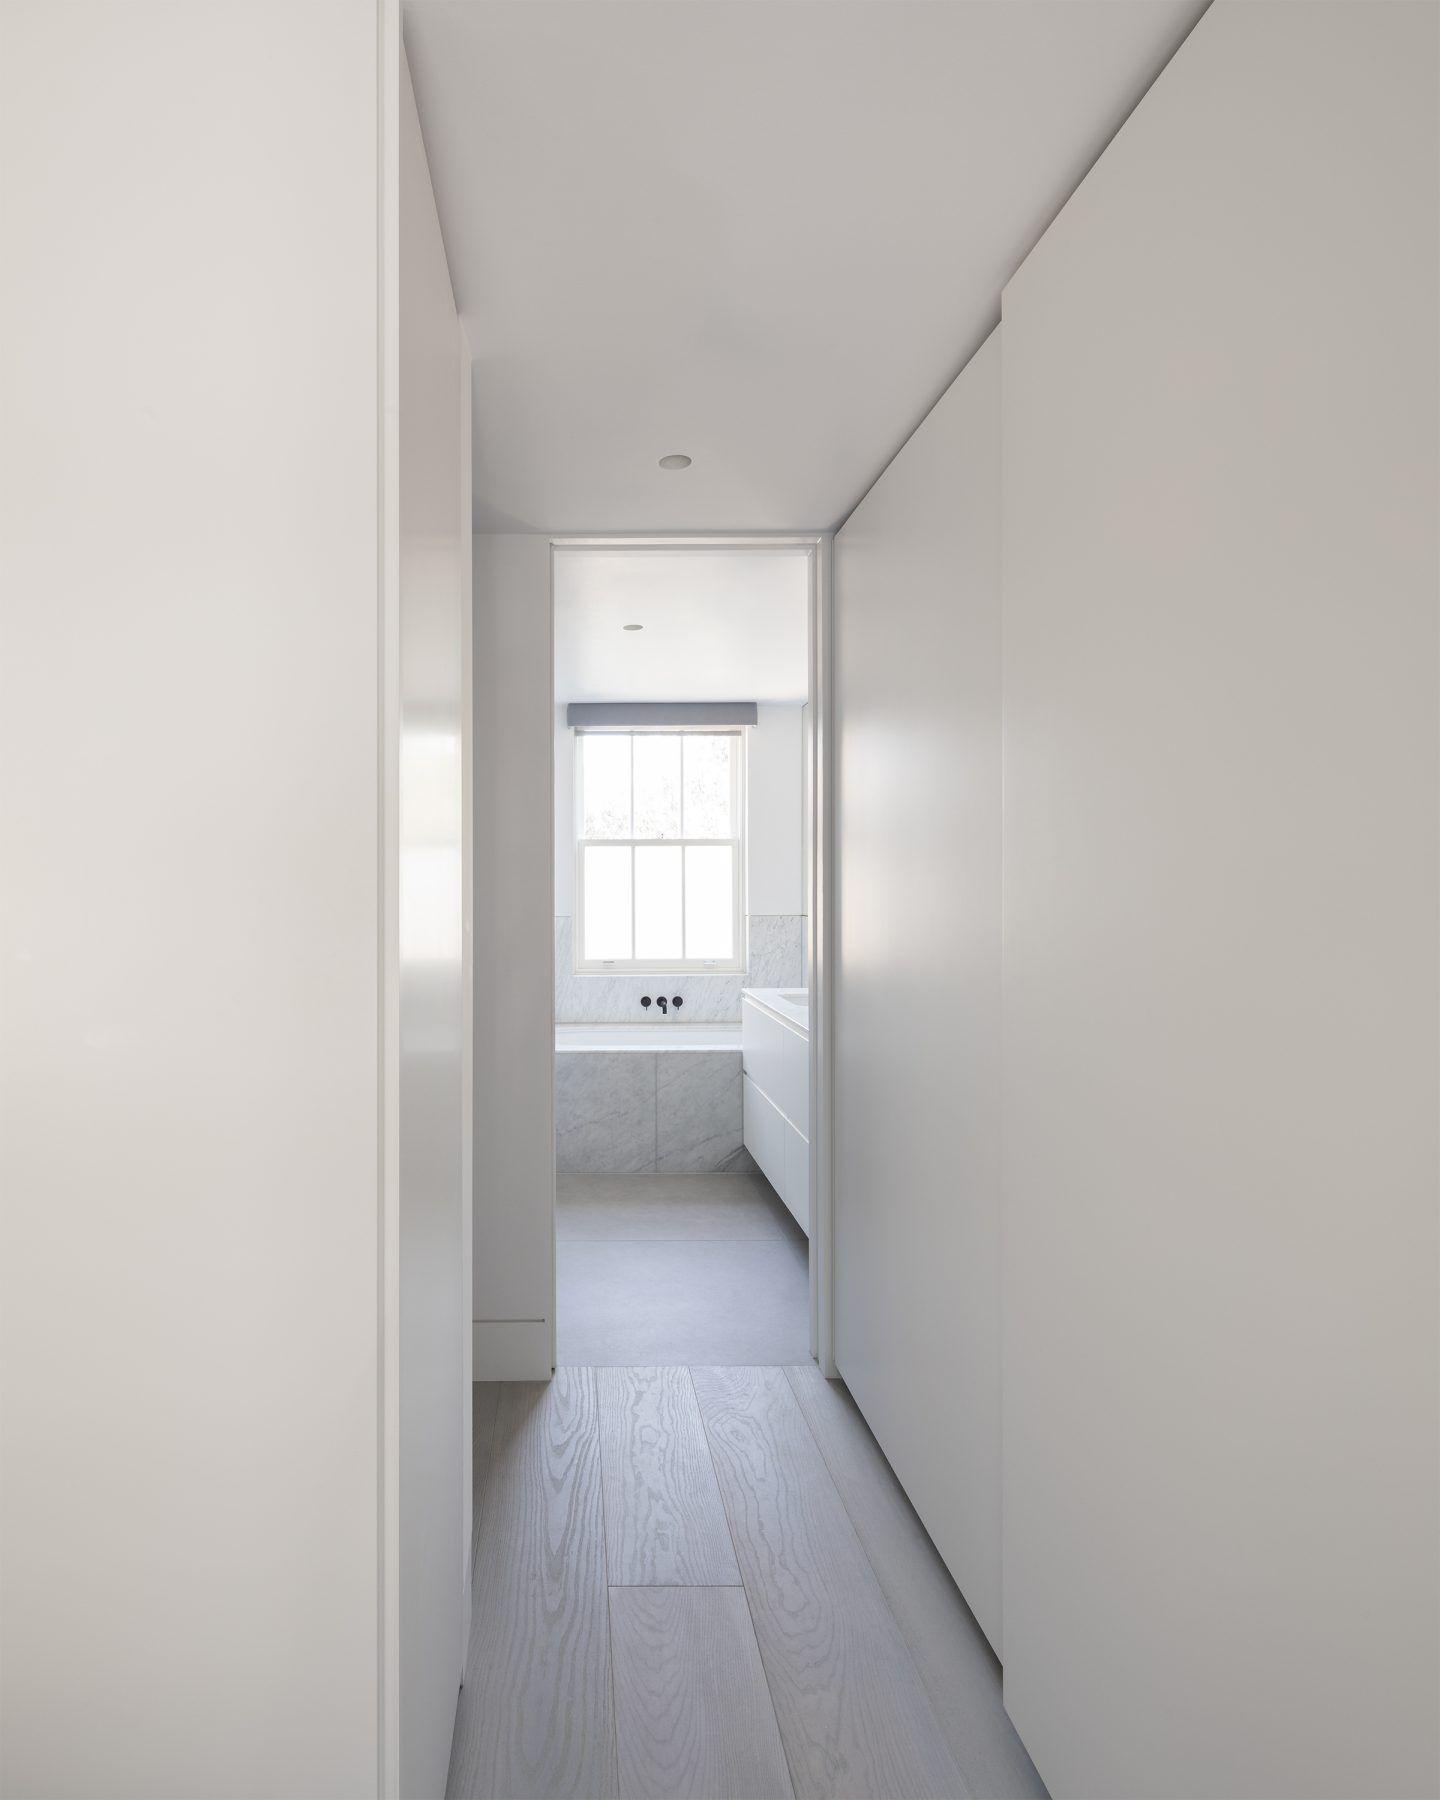 IGNANT-Architecture-Al-Jawad-Pike-Elsley-Road-11